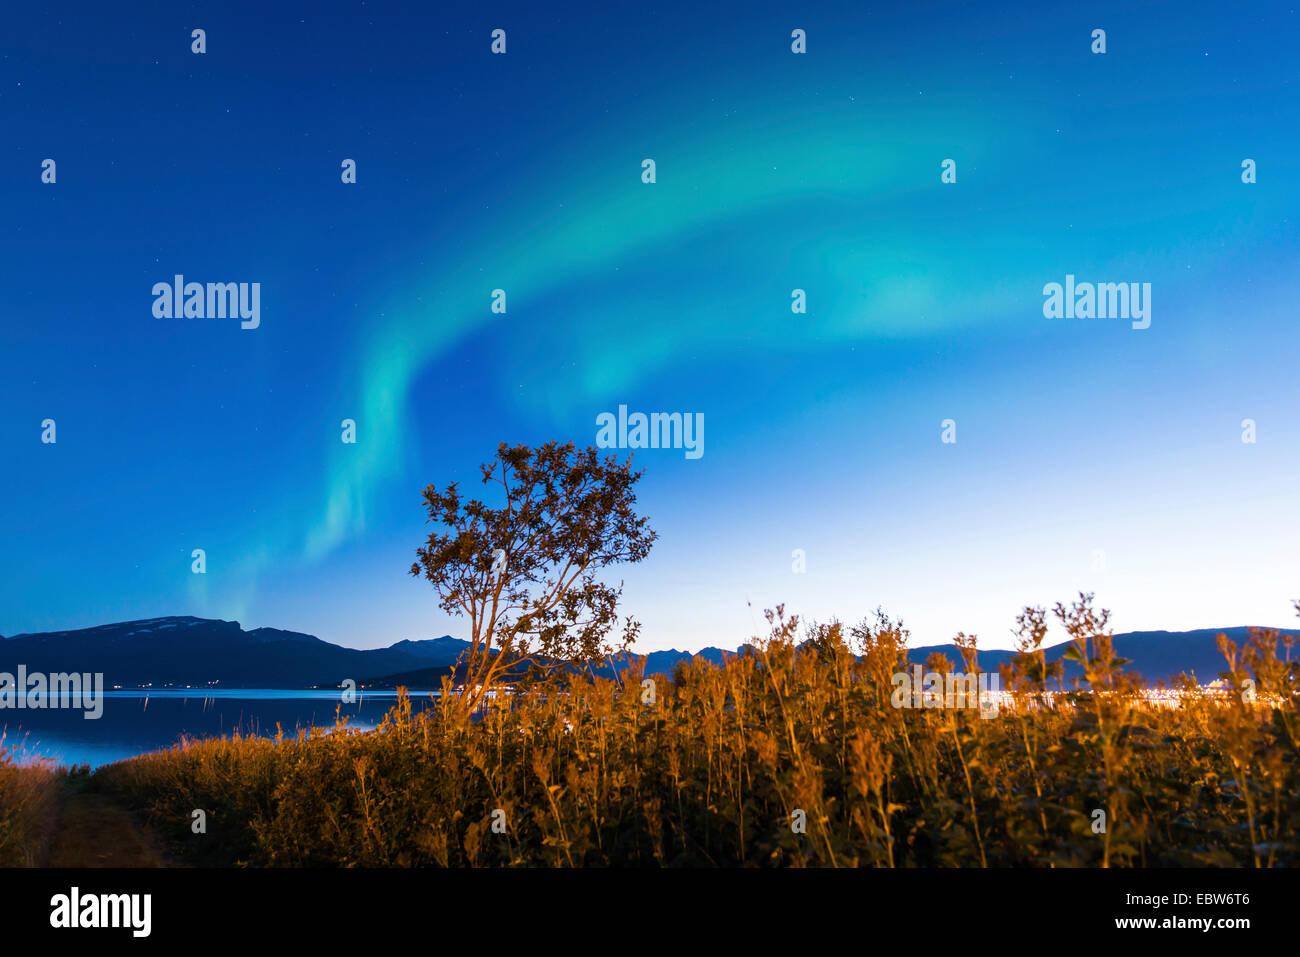 aurora bows over tree, Norway, Troms, Sandnessund, Tromsoe - Stock Image